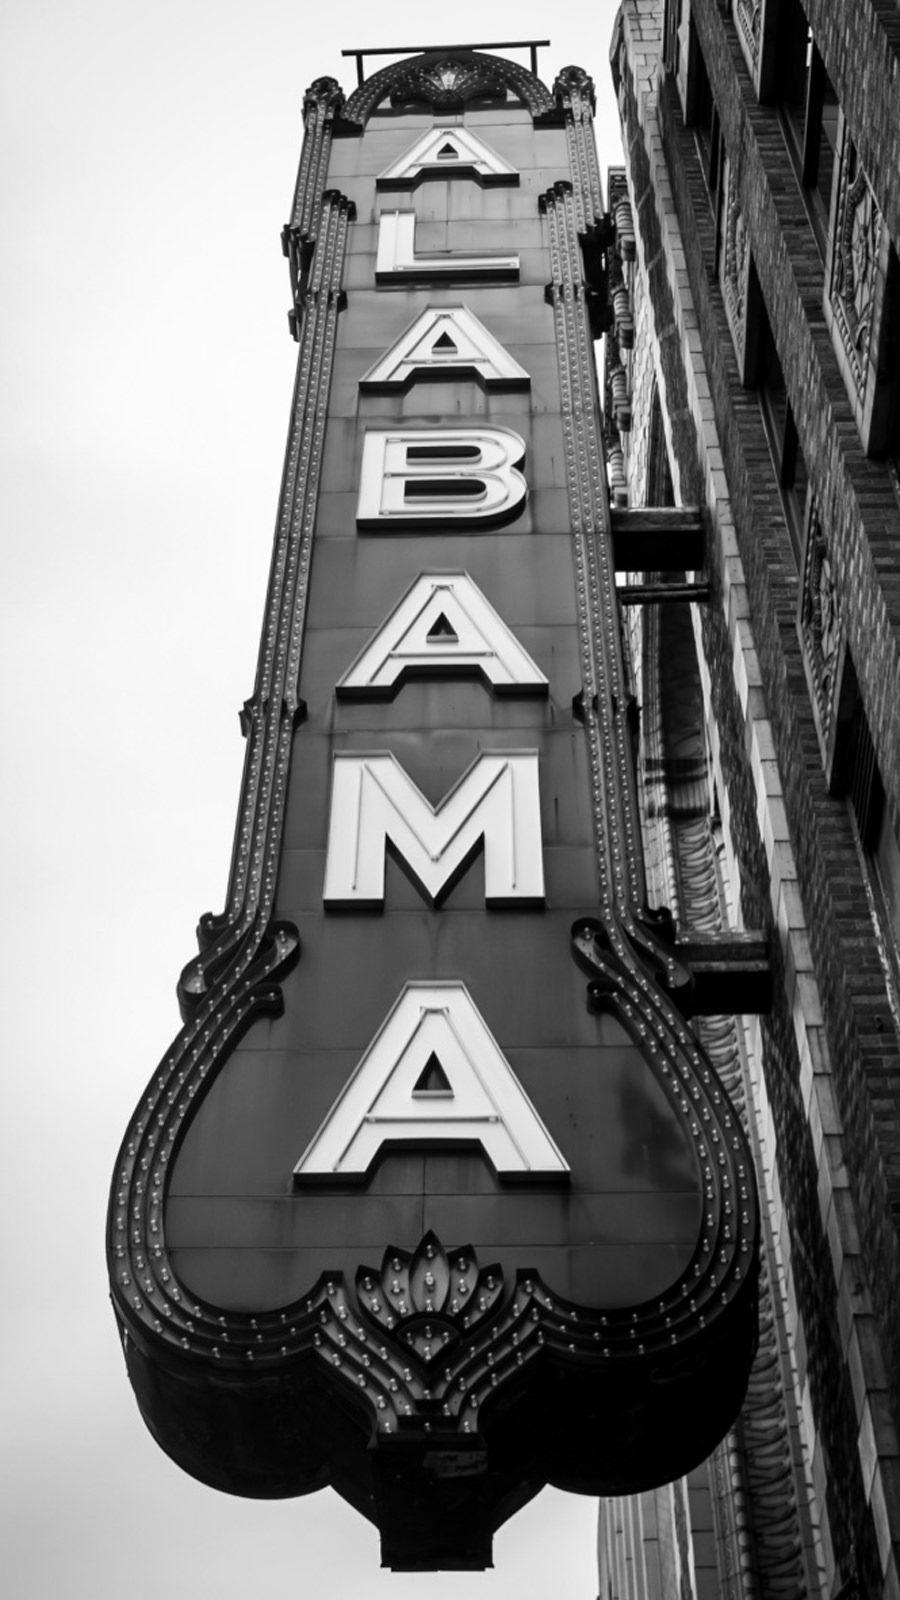 Alabama Theatre sign